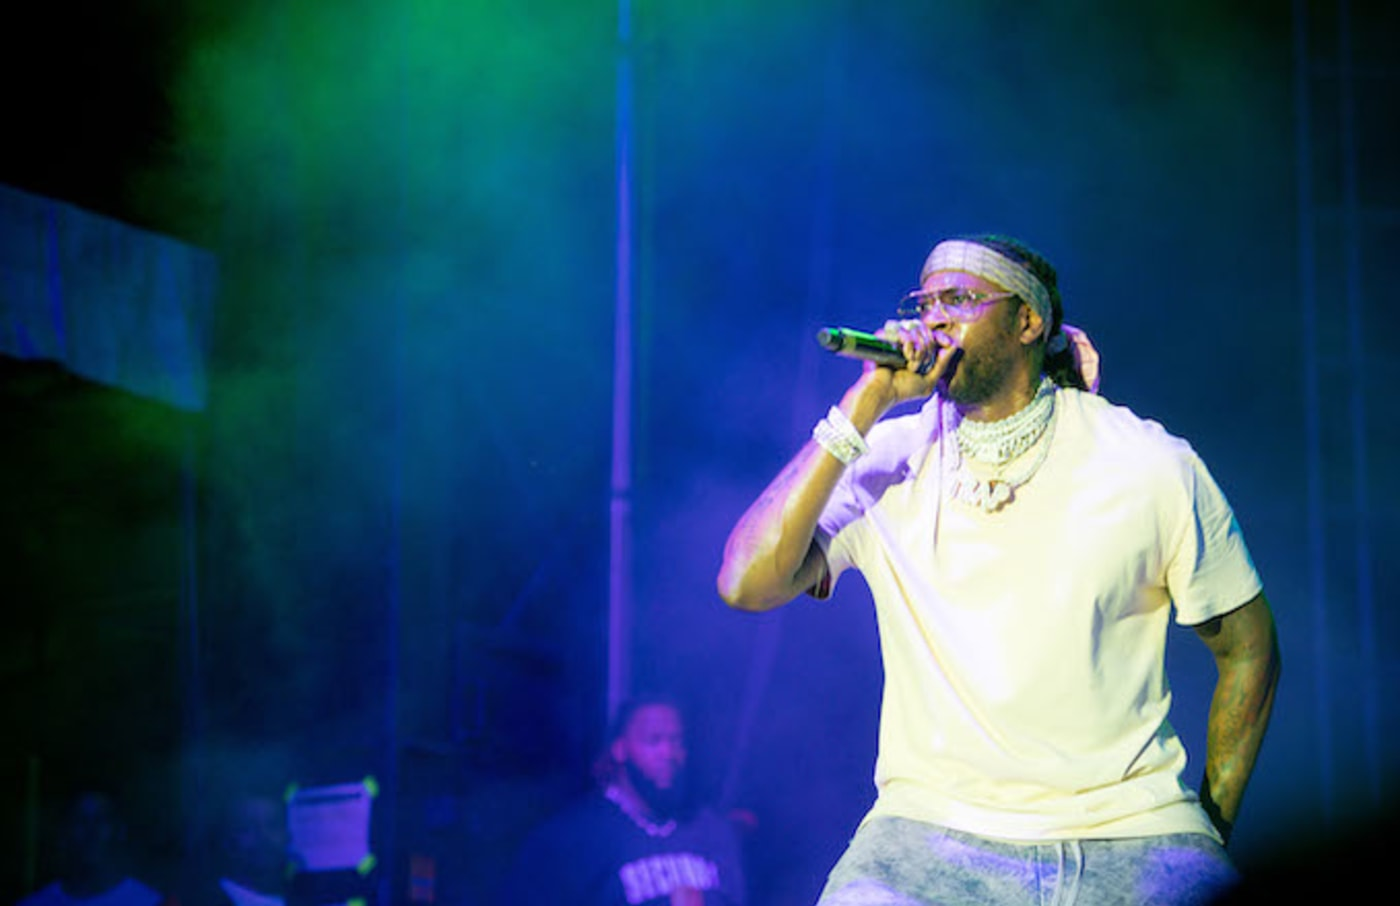 Rapper 2 Chainz.